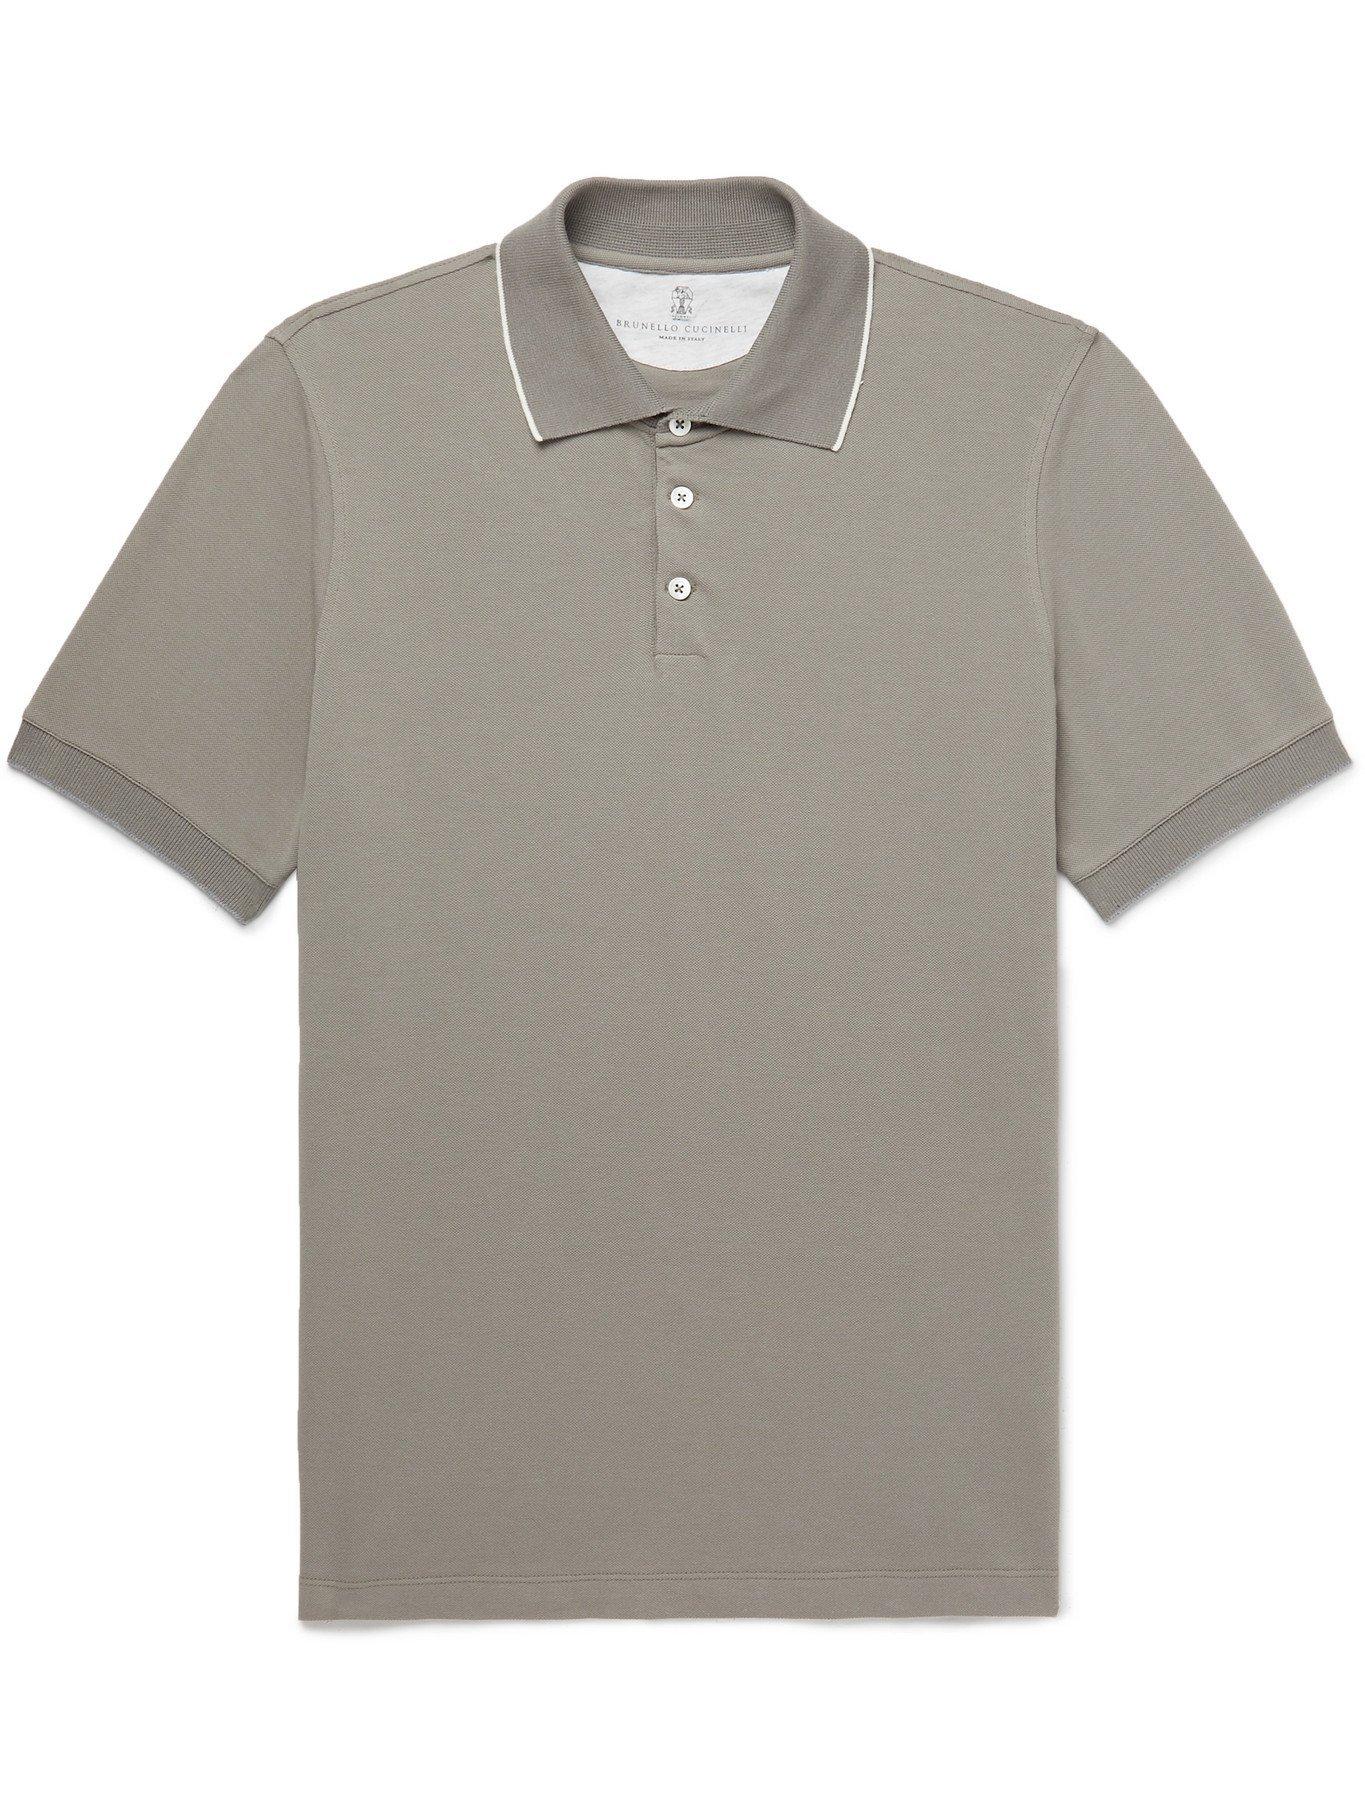 Photo: BRUNELLO CUCINELLI - Slim-Fit Contrast-Tipped Cotton-Piqué Polo Shirt - Green - M